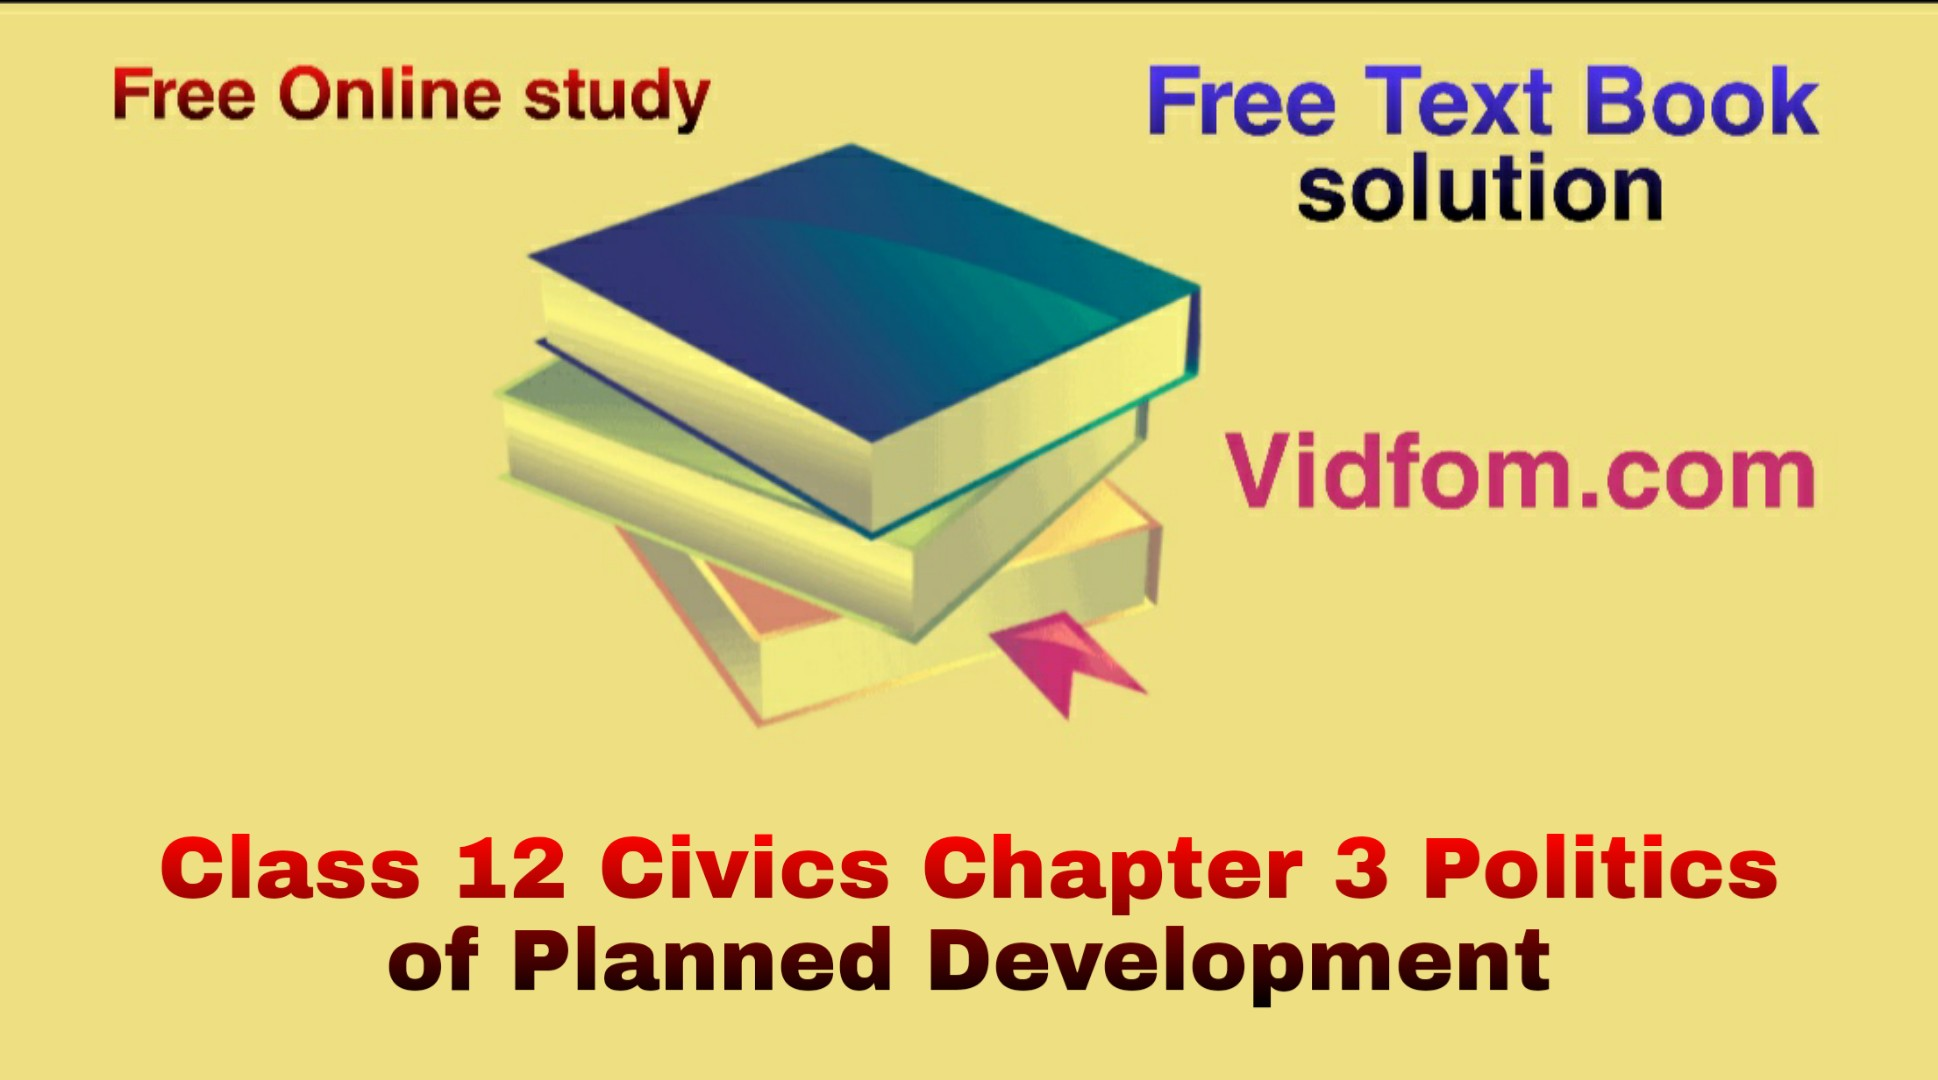 Class 12 Civics Chapter 3 Politics of Planned Development